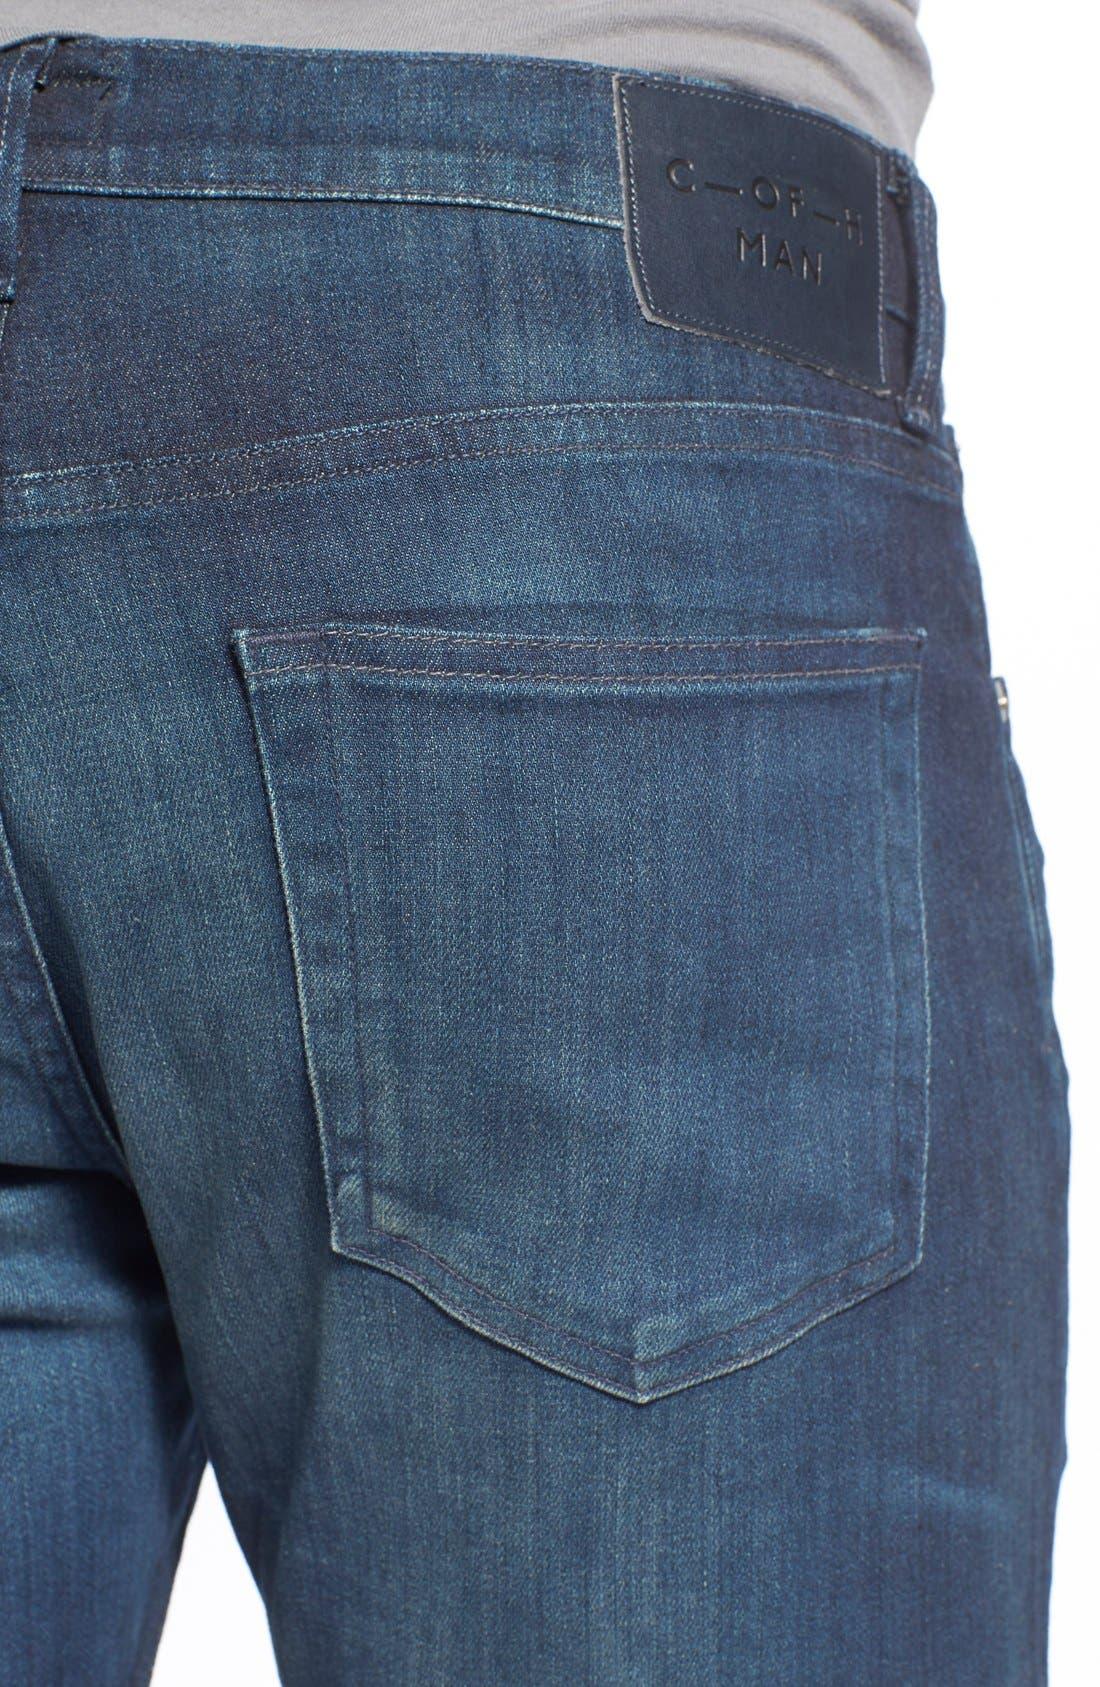 'Sid Classic' Straight Leg Jeans,                             Alternate thumbnail 9, color,                             473